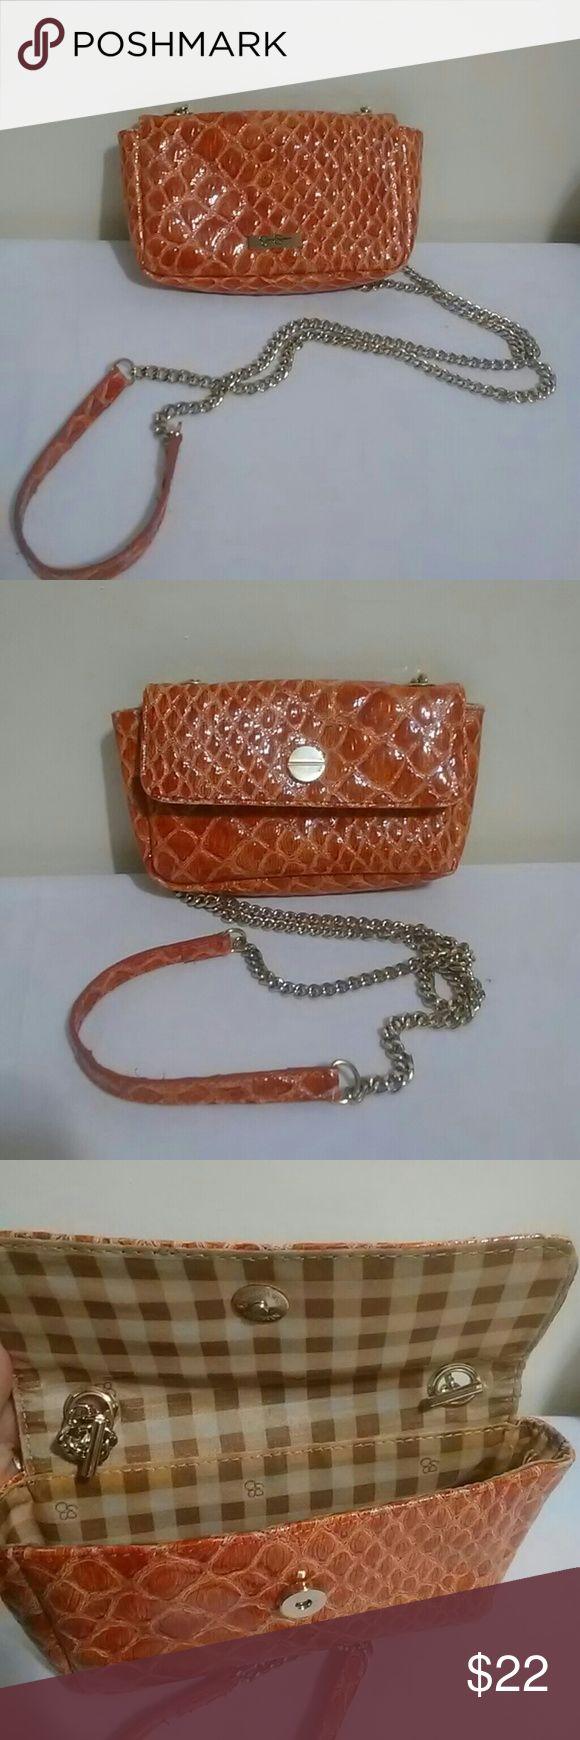 💥Jessica Simpson purse💥 Jessica Simpson purse Jessica Simpson Bags Mini Bags